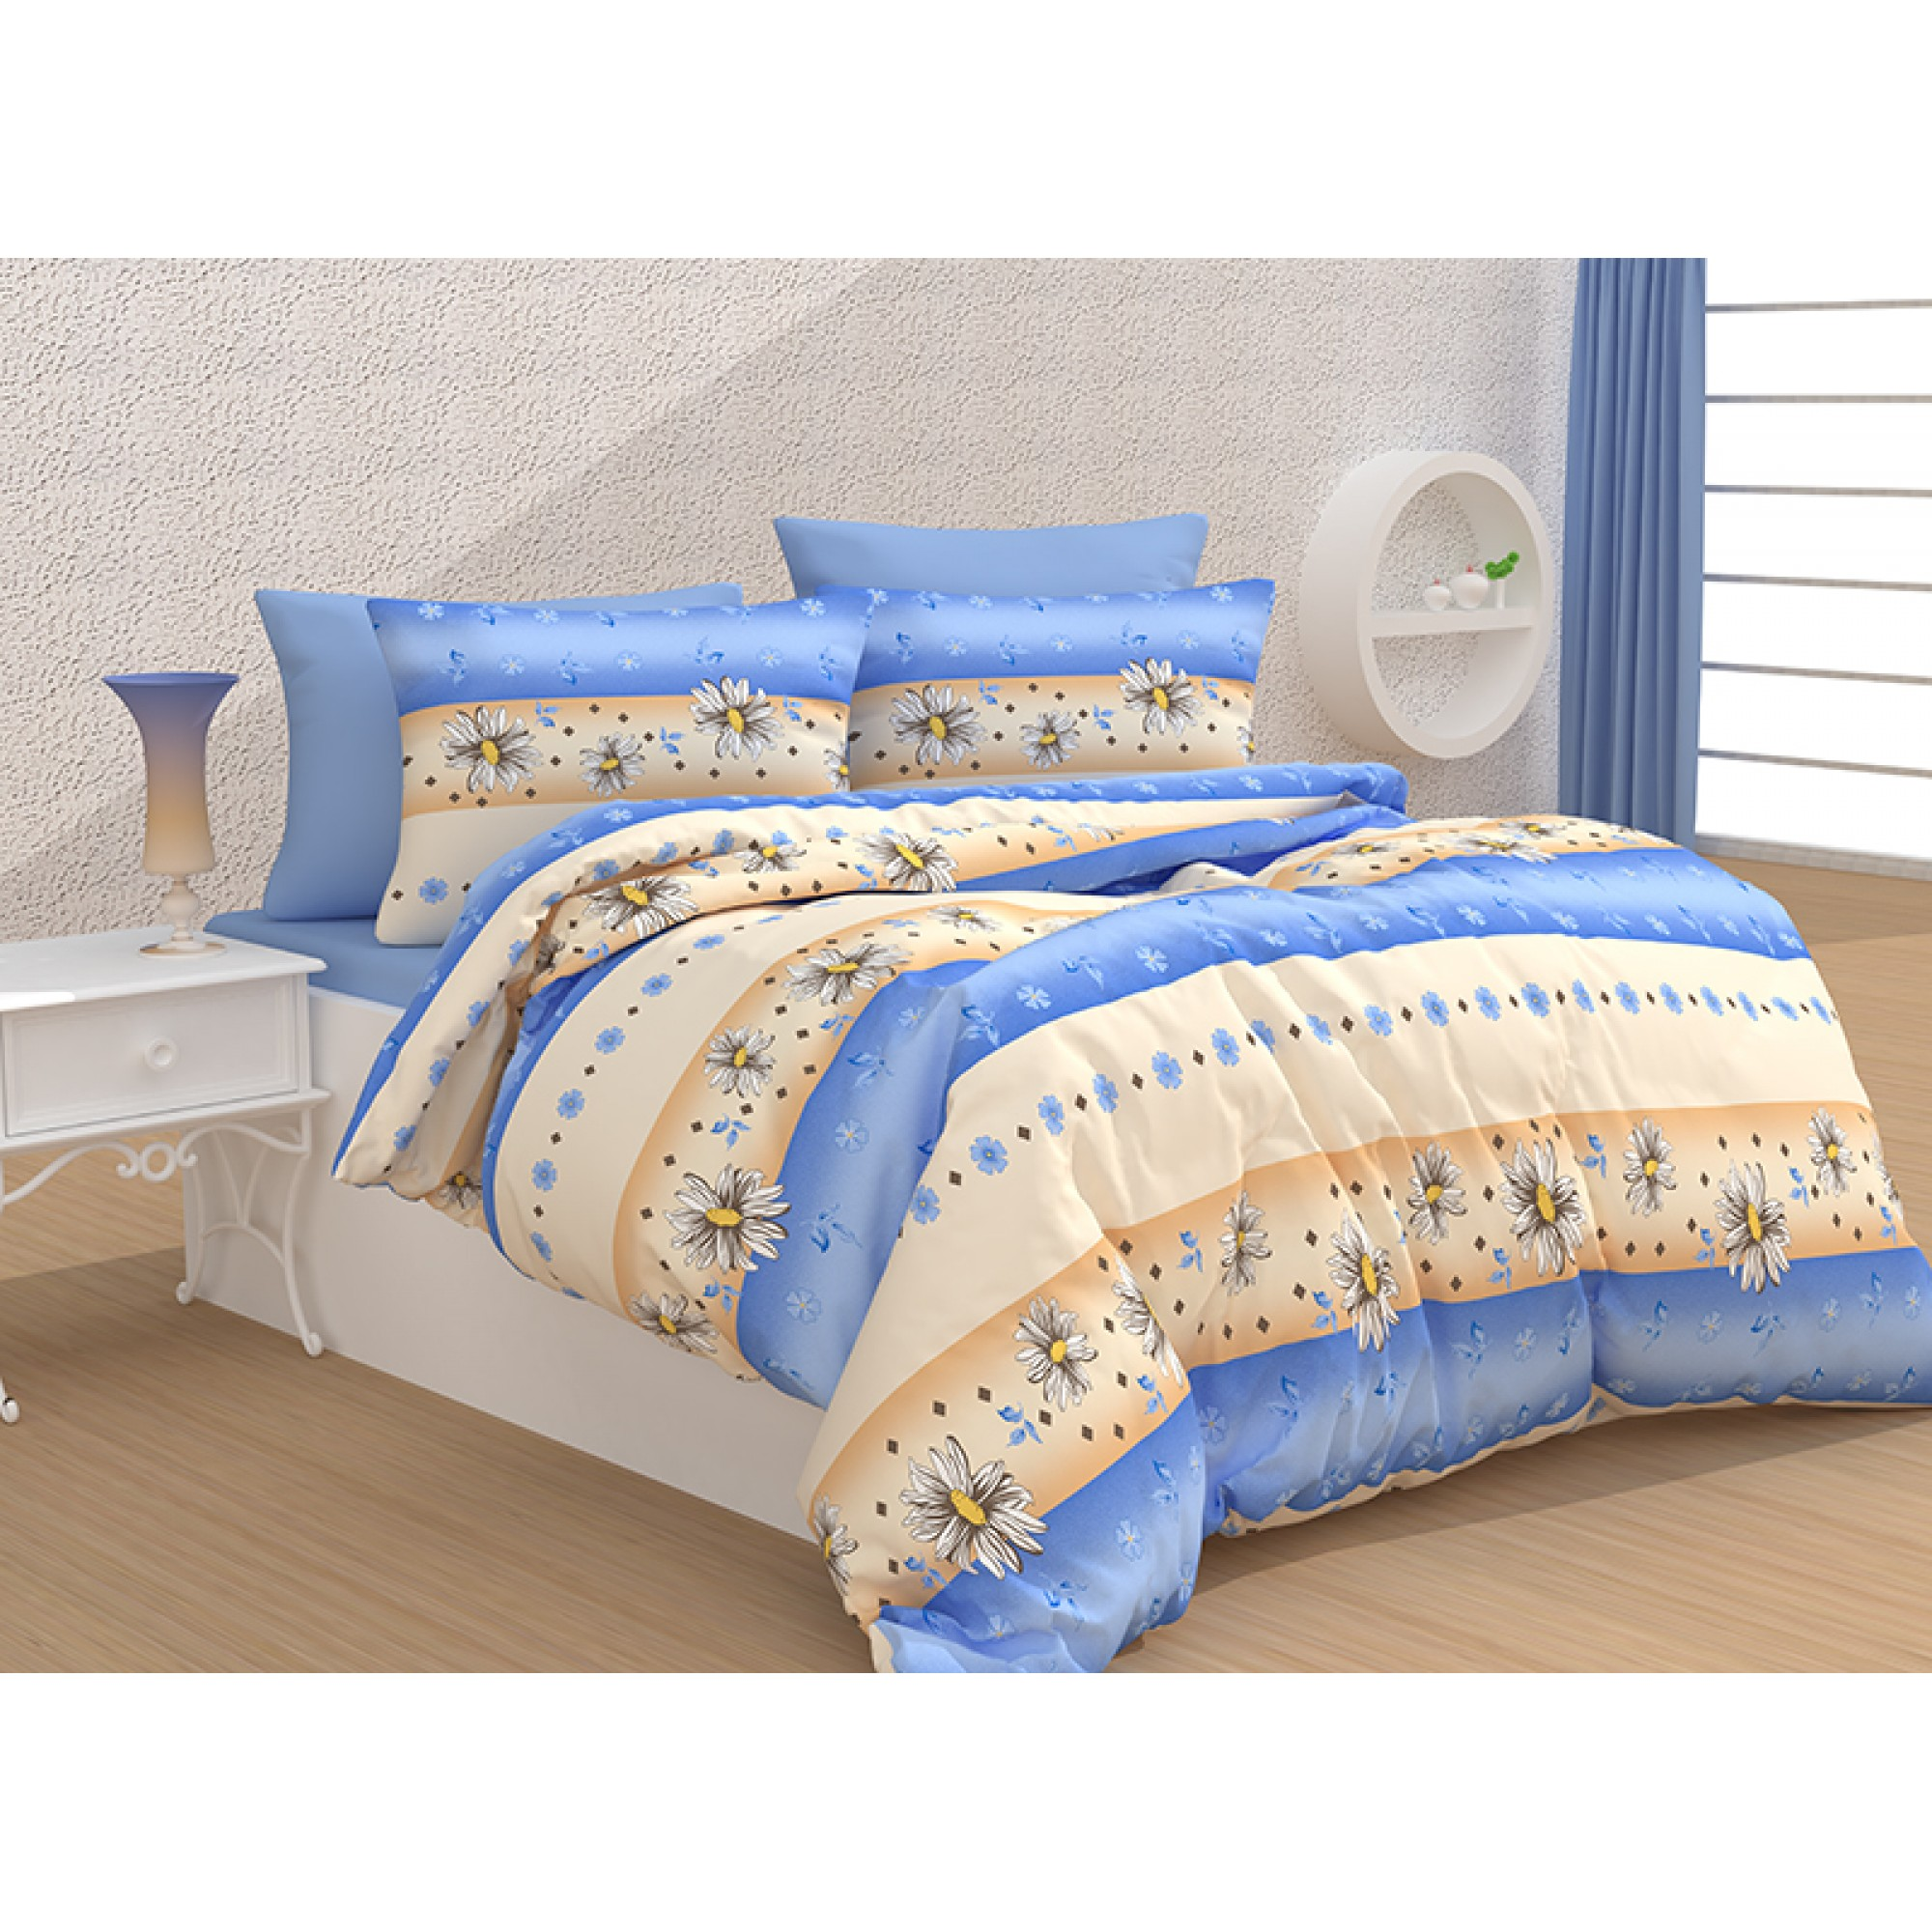 Памучно спално бельо Blue Daisy от КЕТЕРТЕКС